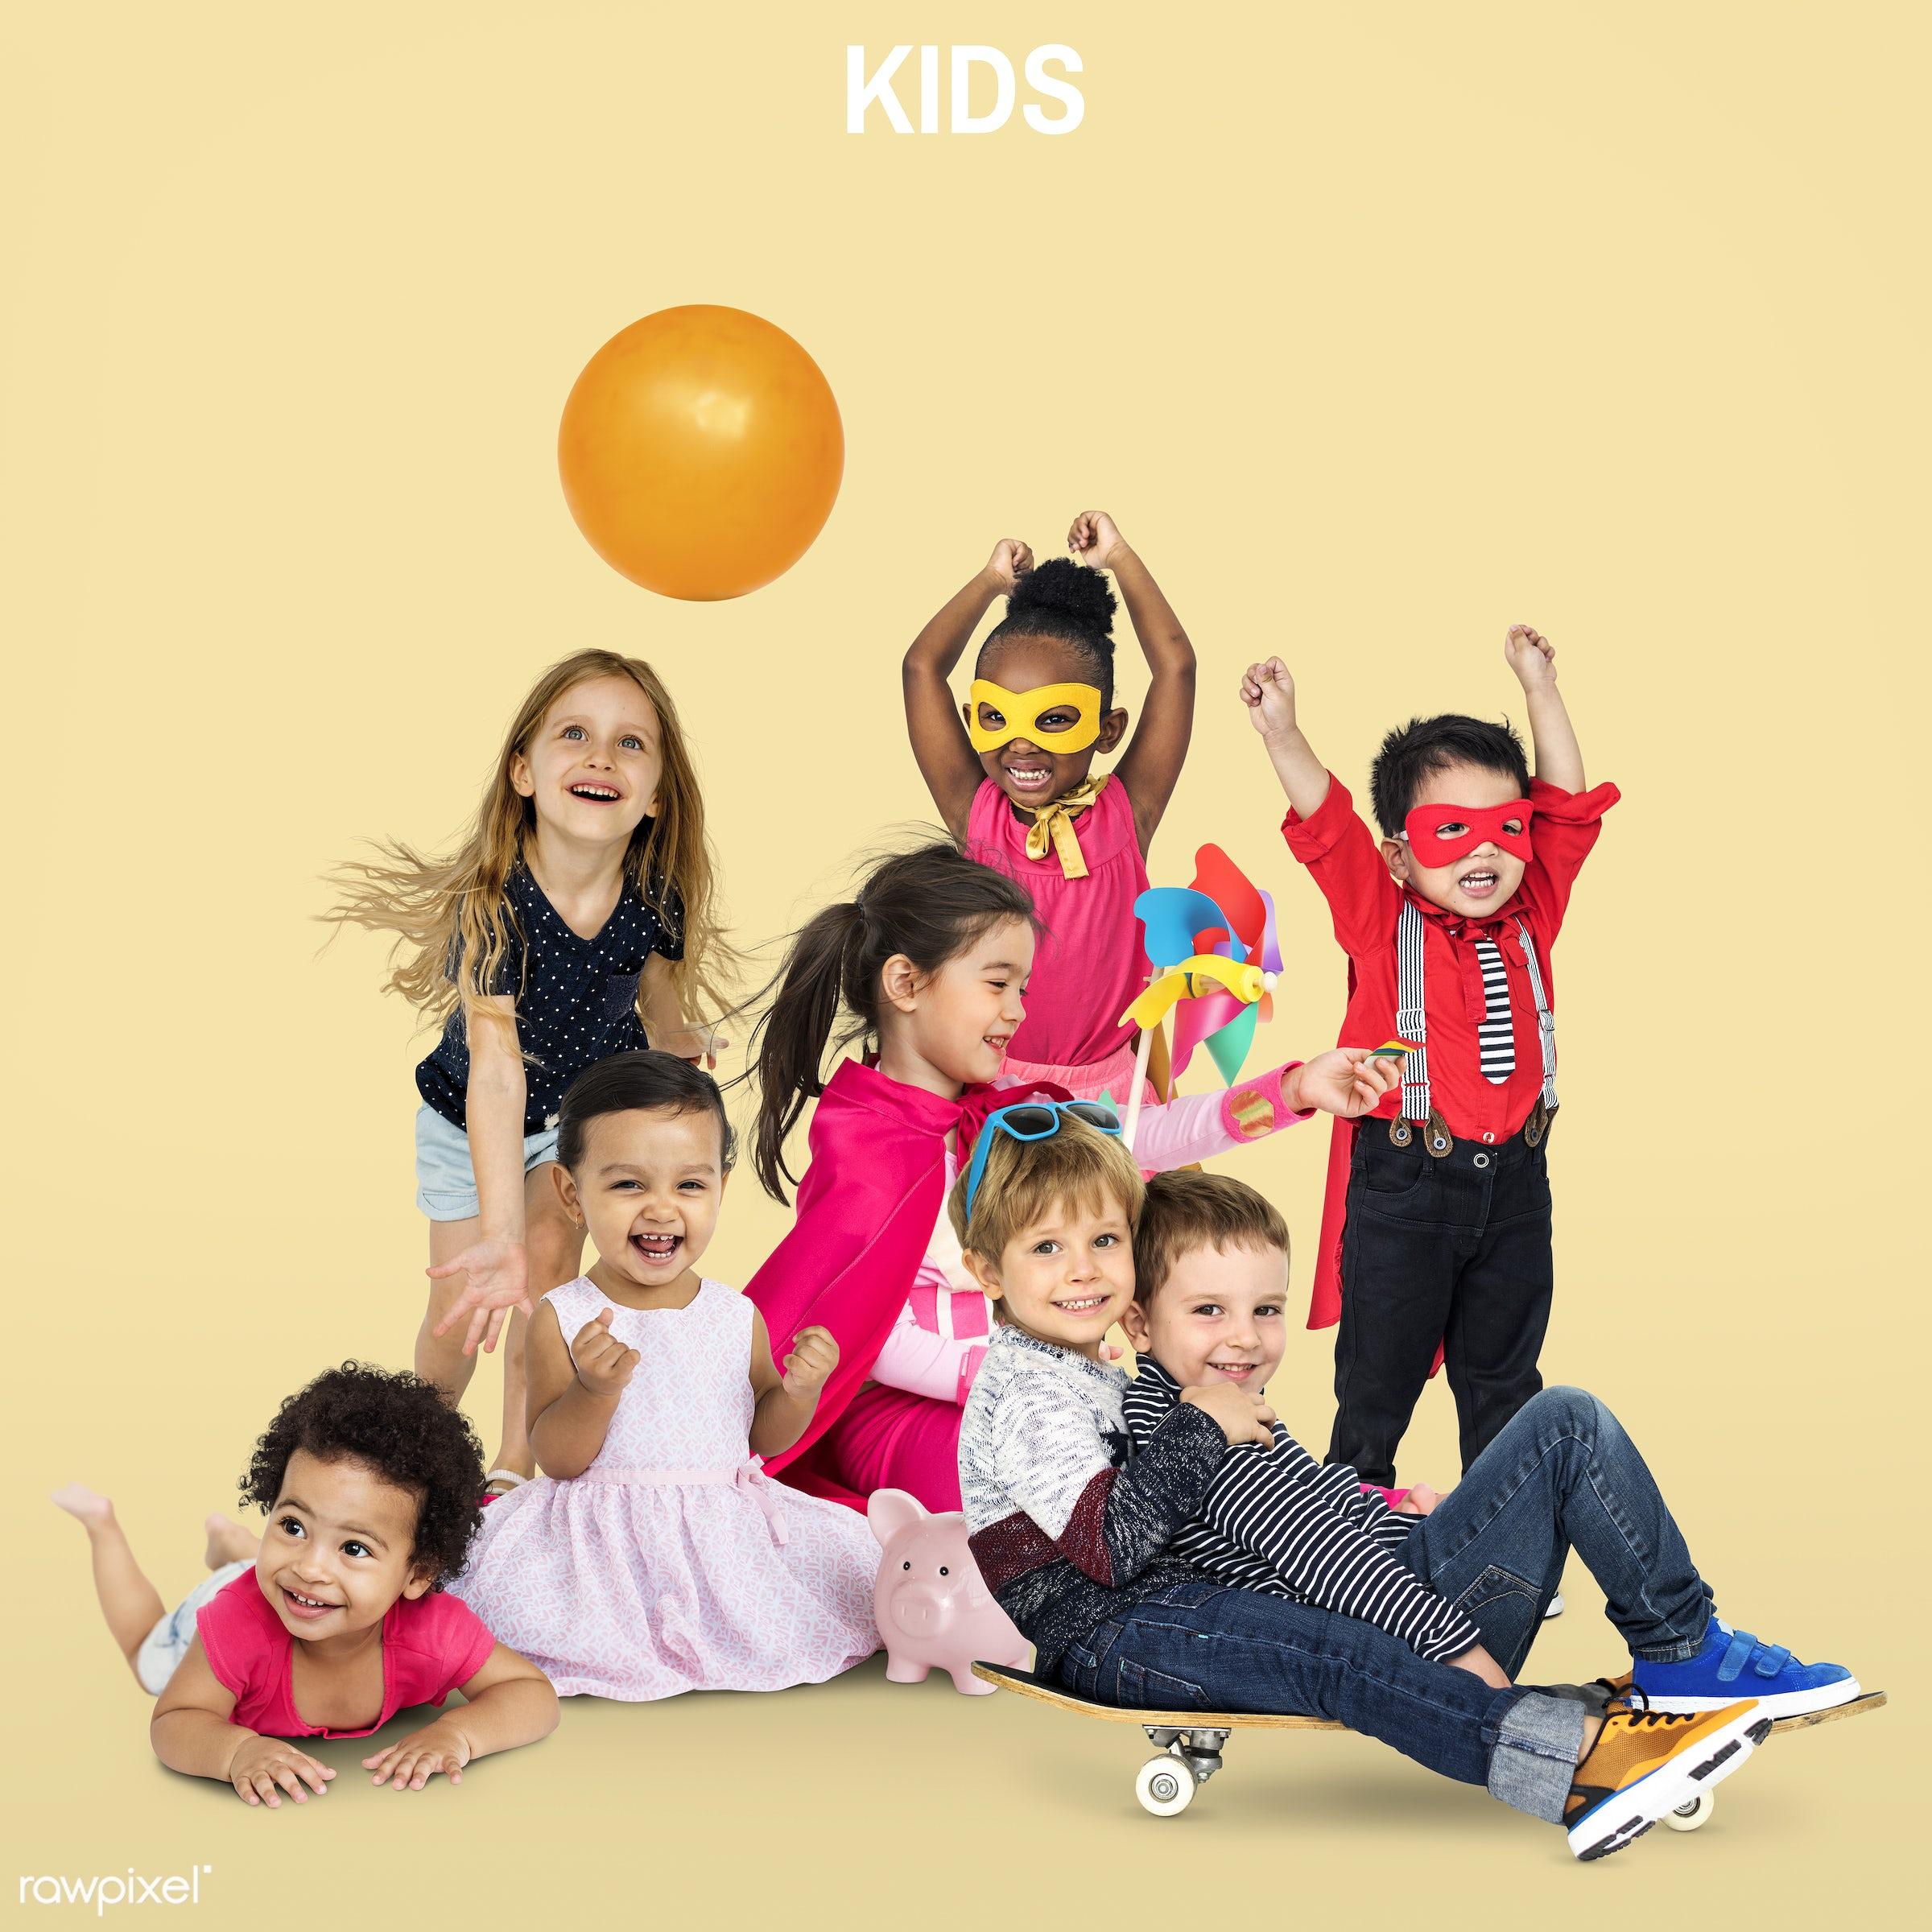 expression, little, bonding, people, together, caucasian, friends, lifestyle, friendship, childhood, studio squareset, smile...